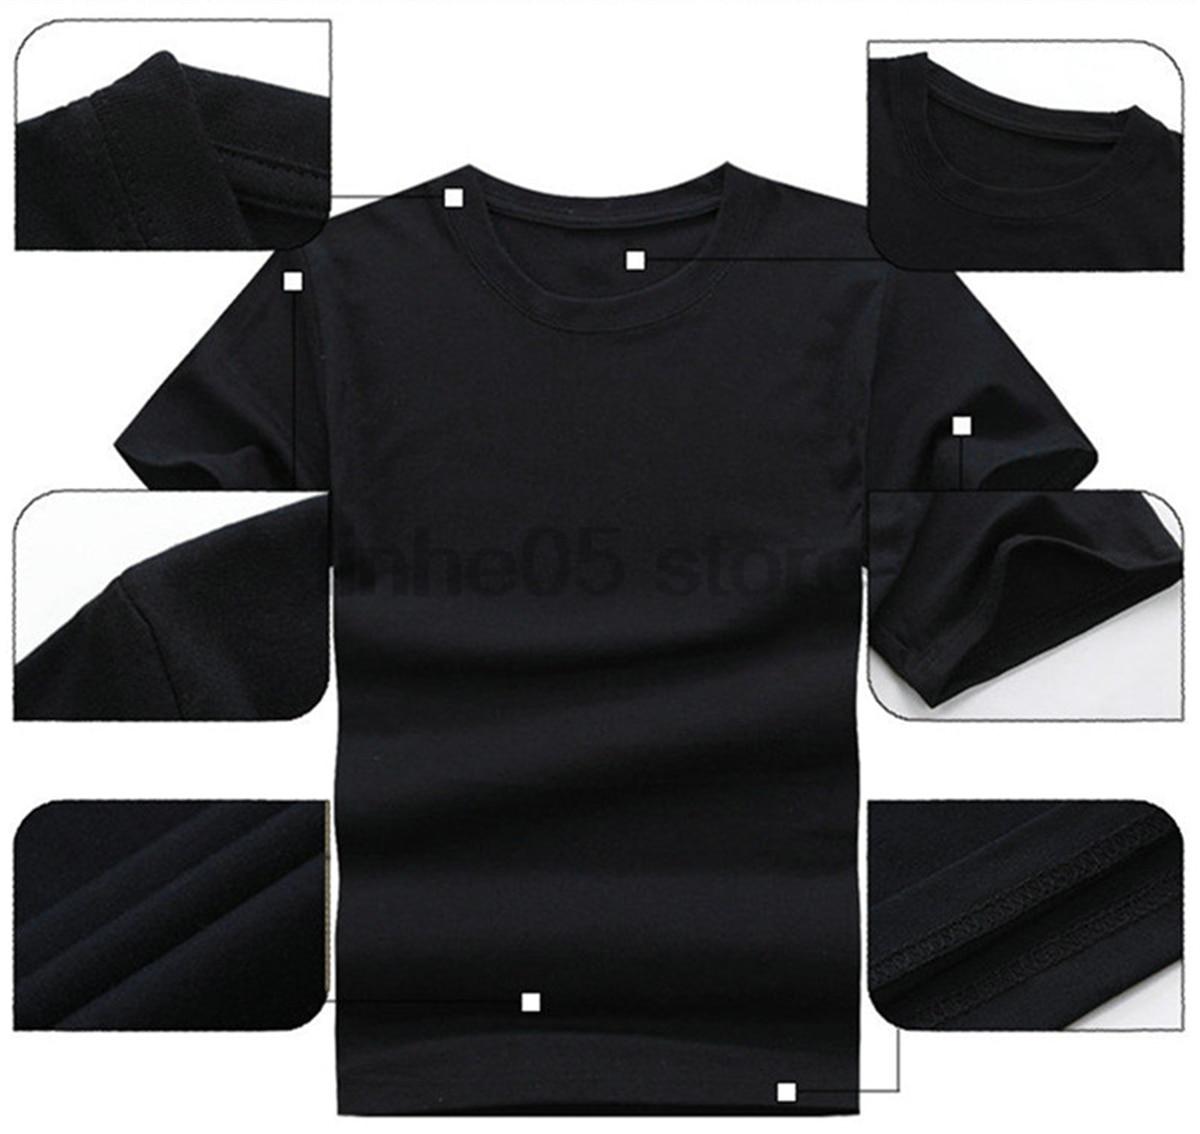 GILDAN UPC bar code Christian cross shirt - PAID IN FULL Womens T-shirt